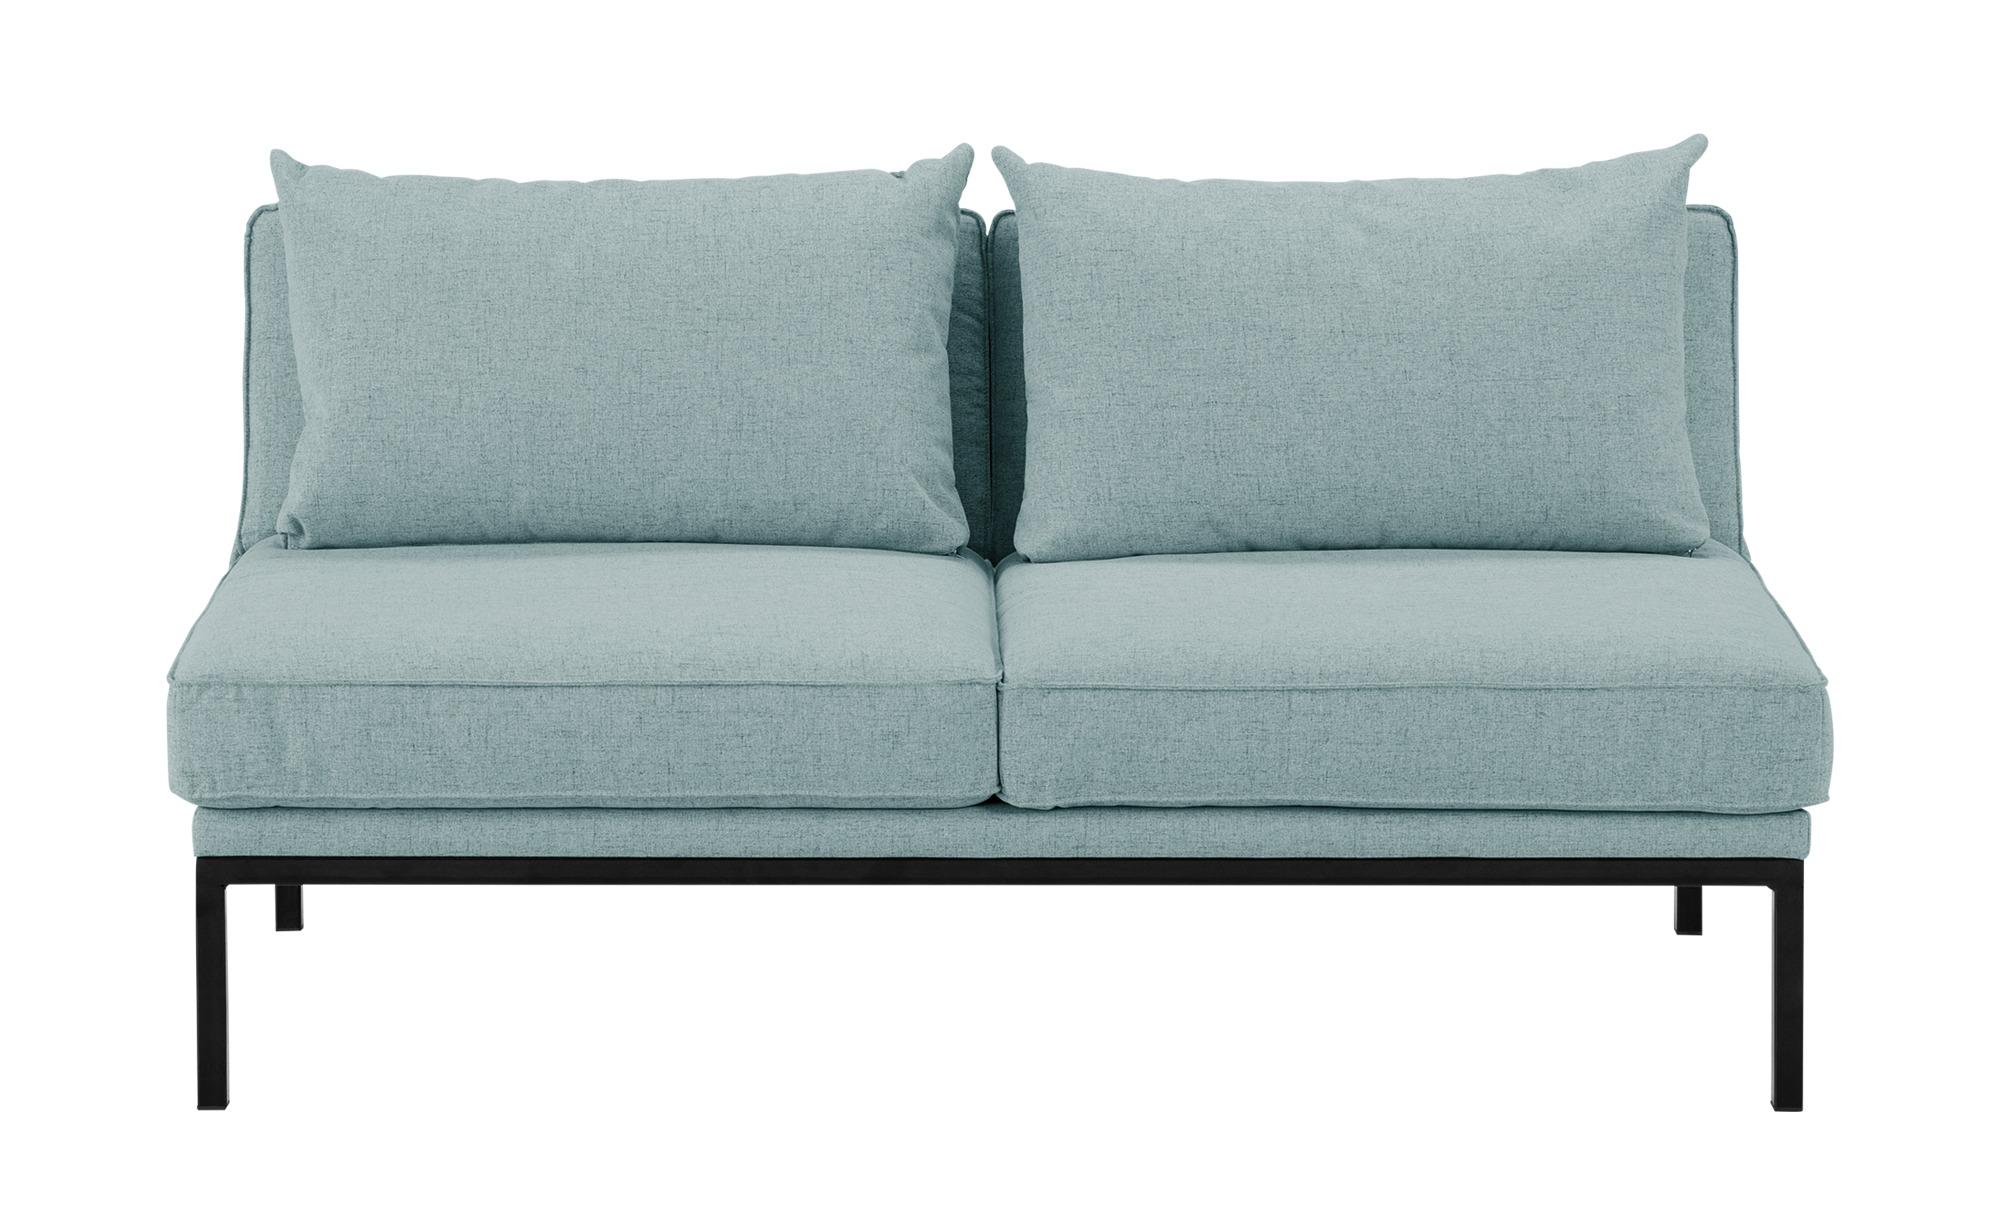 Funktionssofa, 2-sitzig  Laura ¦ grün ¦ Maße (cm): B: 160 H: 45 T: 80 Polstermöbel > Sofas > 2-Sitzer - Höffner